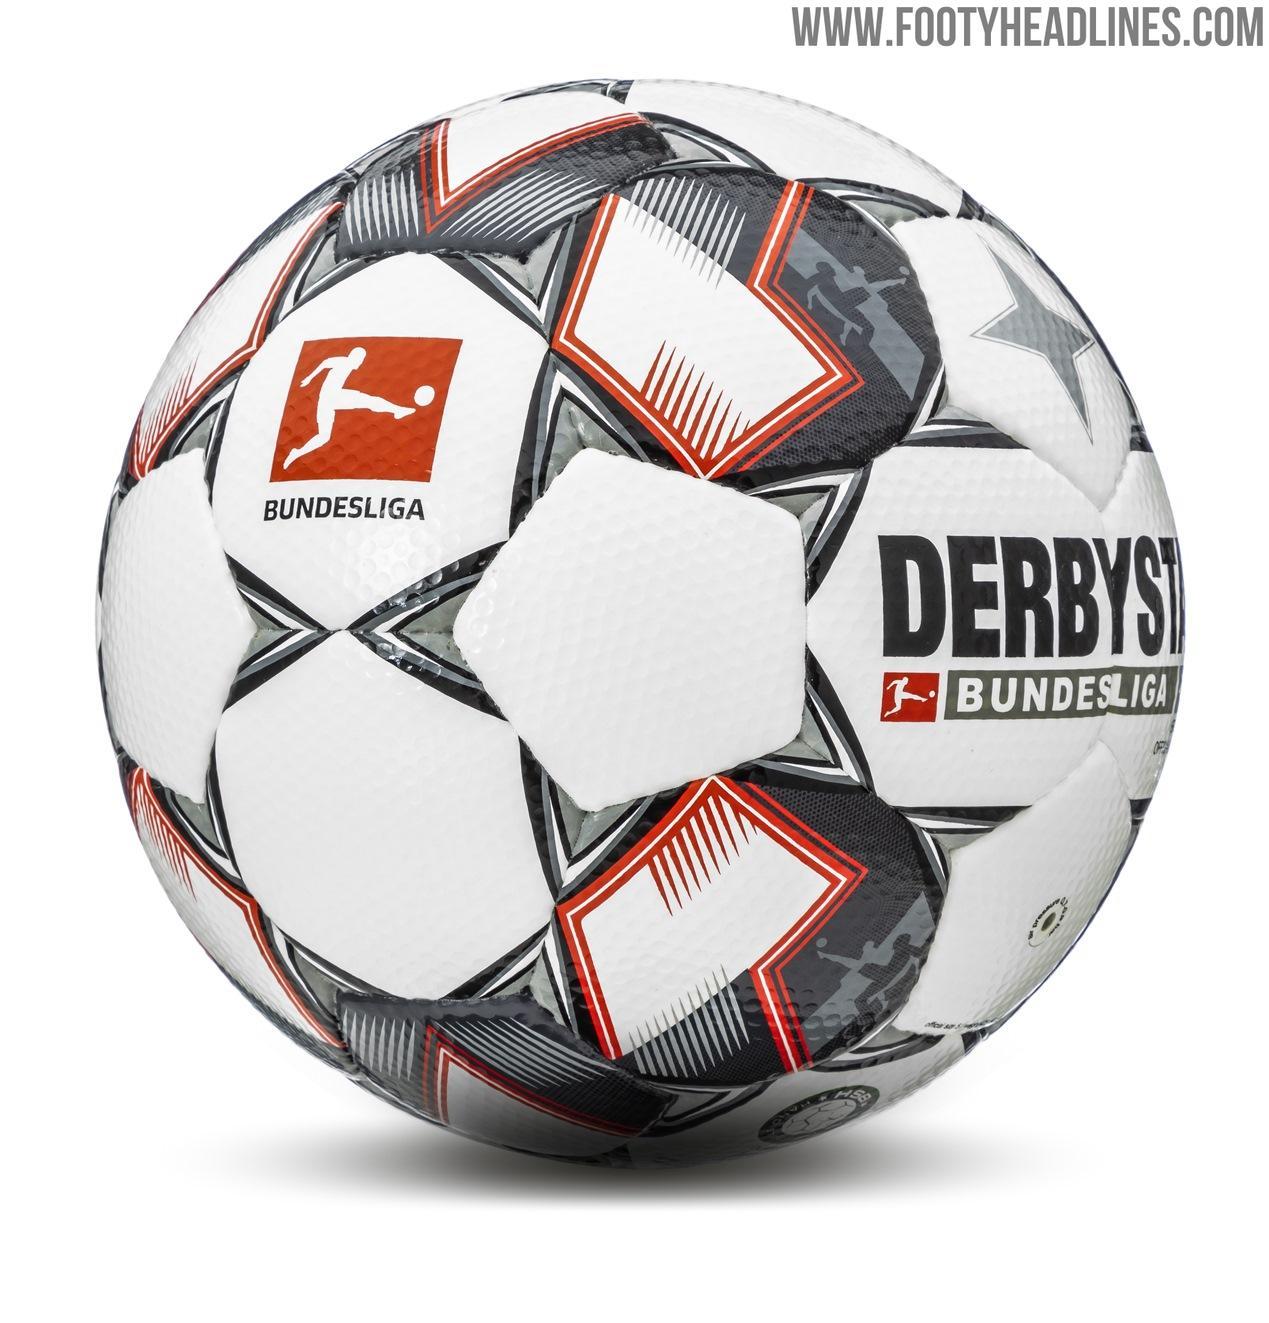 fußball bundesliga 2019 19